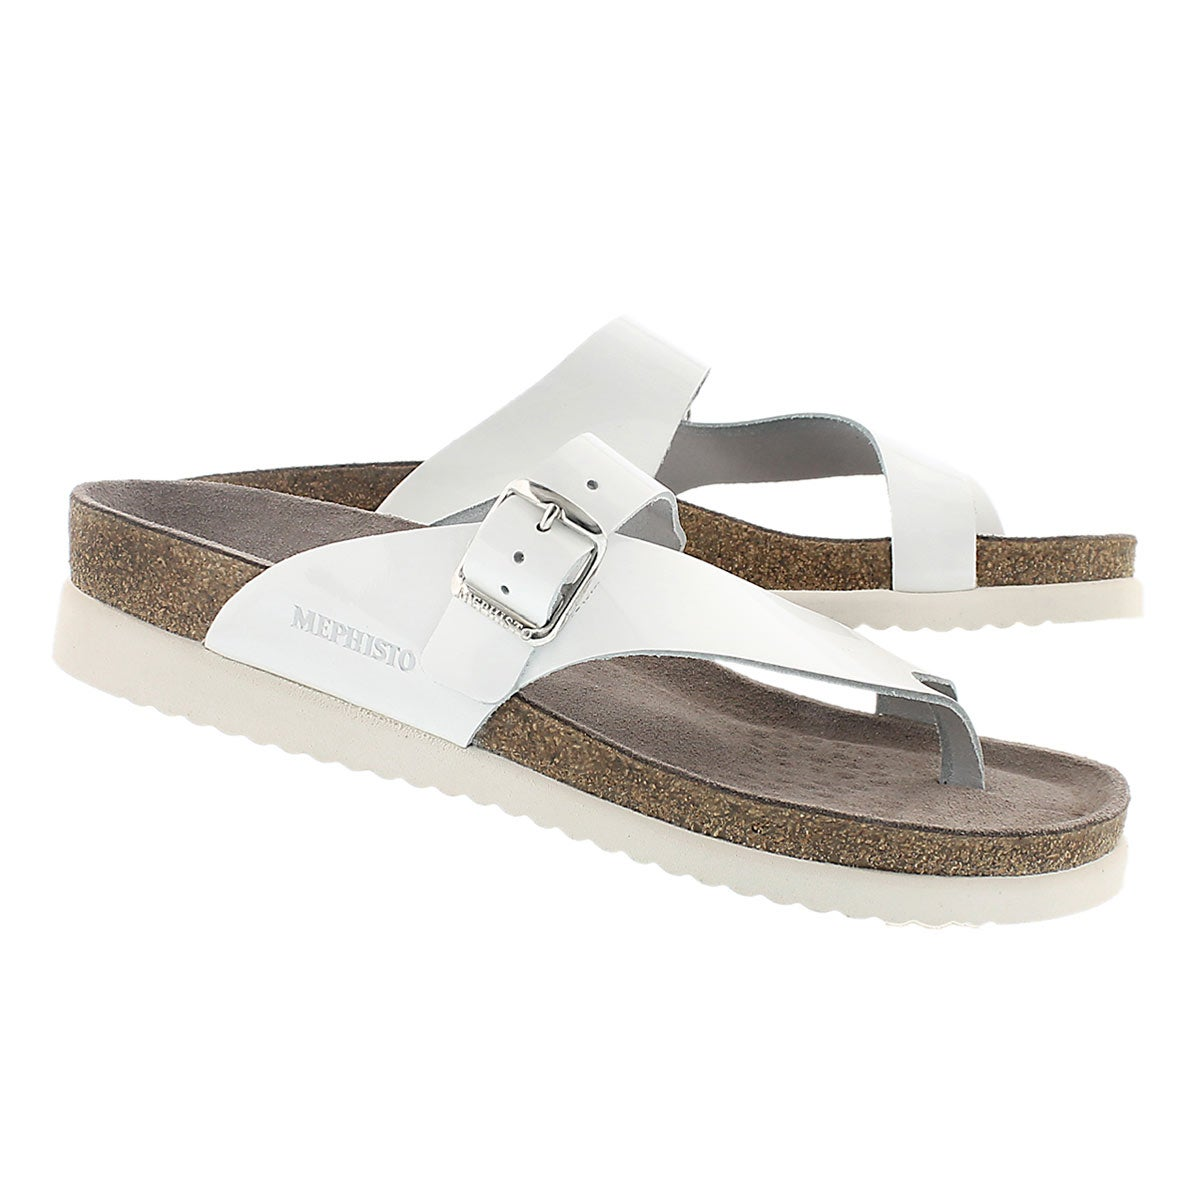 Lds Helen white patent thong sandal